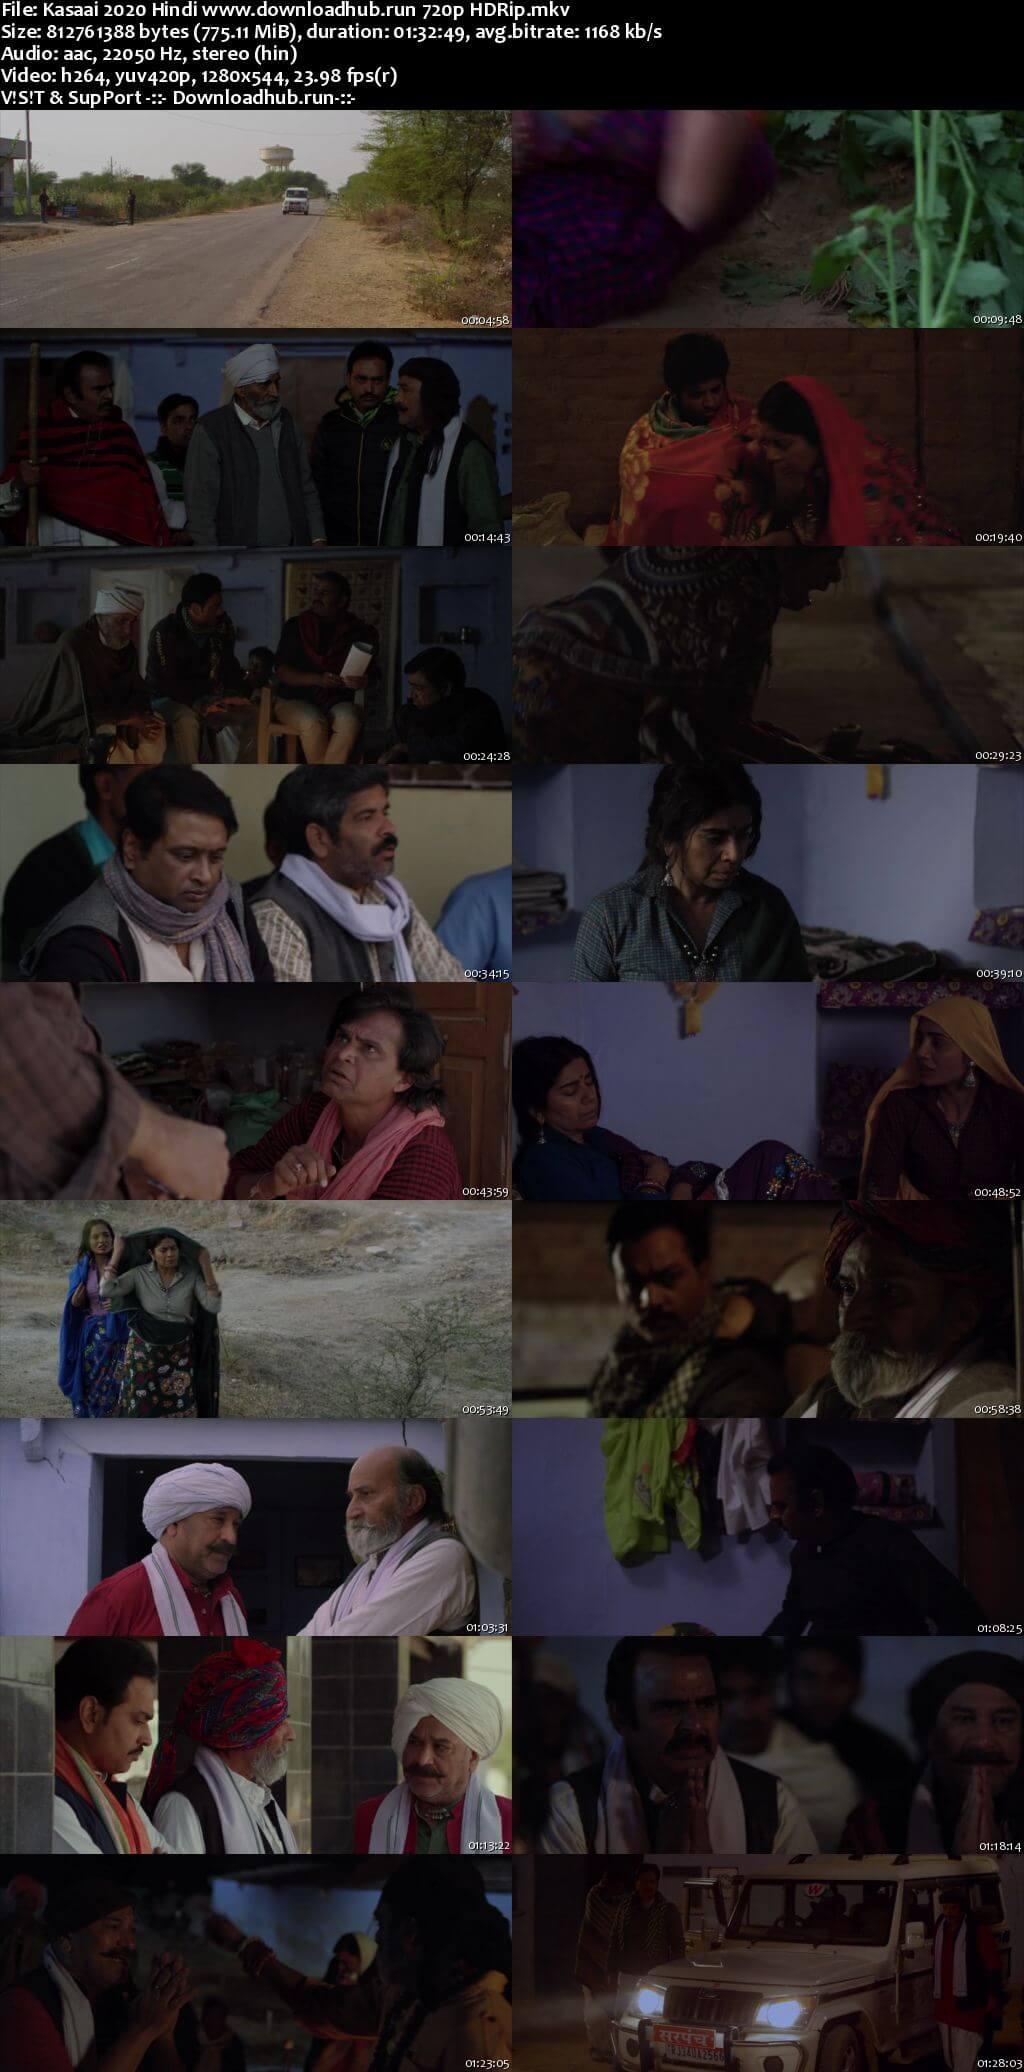 Kasaai 2020 Hindi 720p HDRip x264